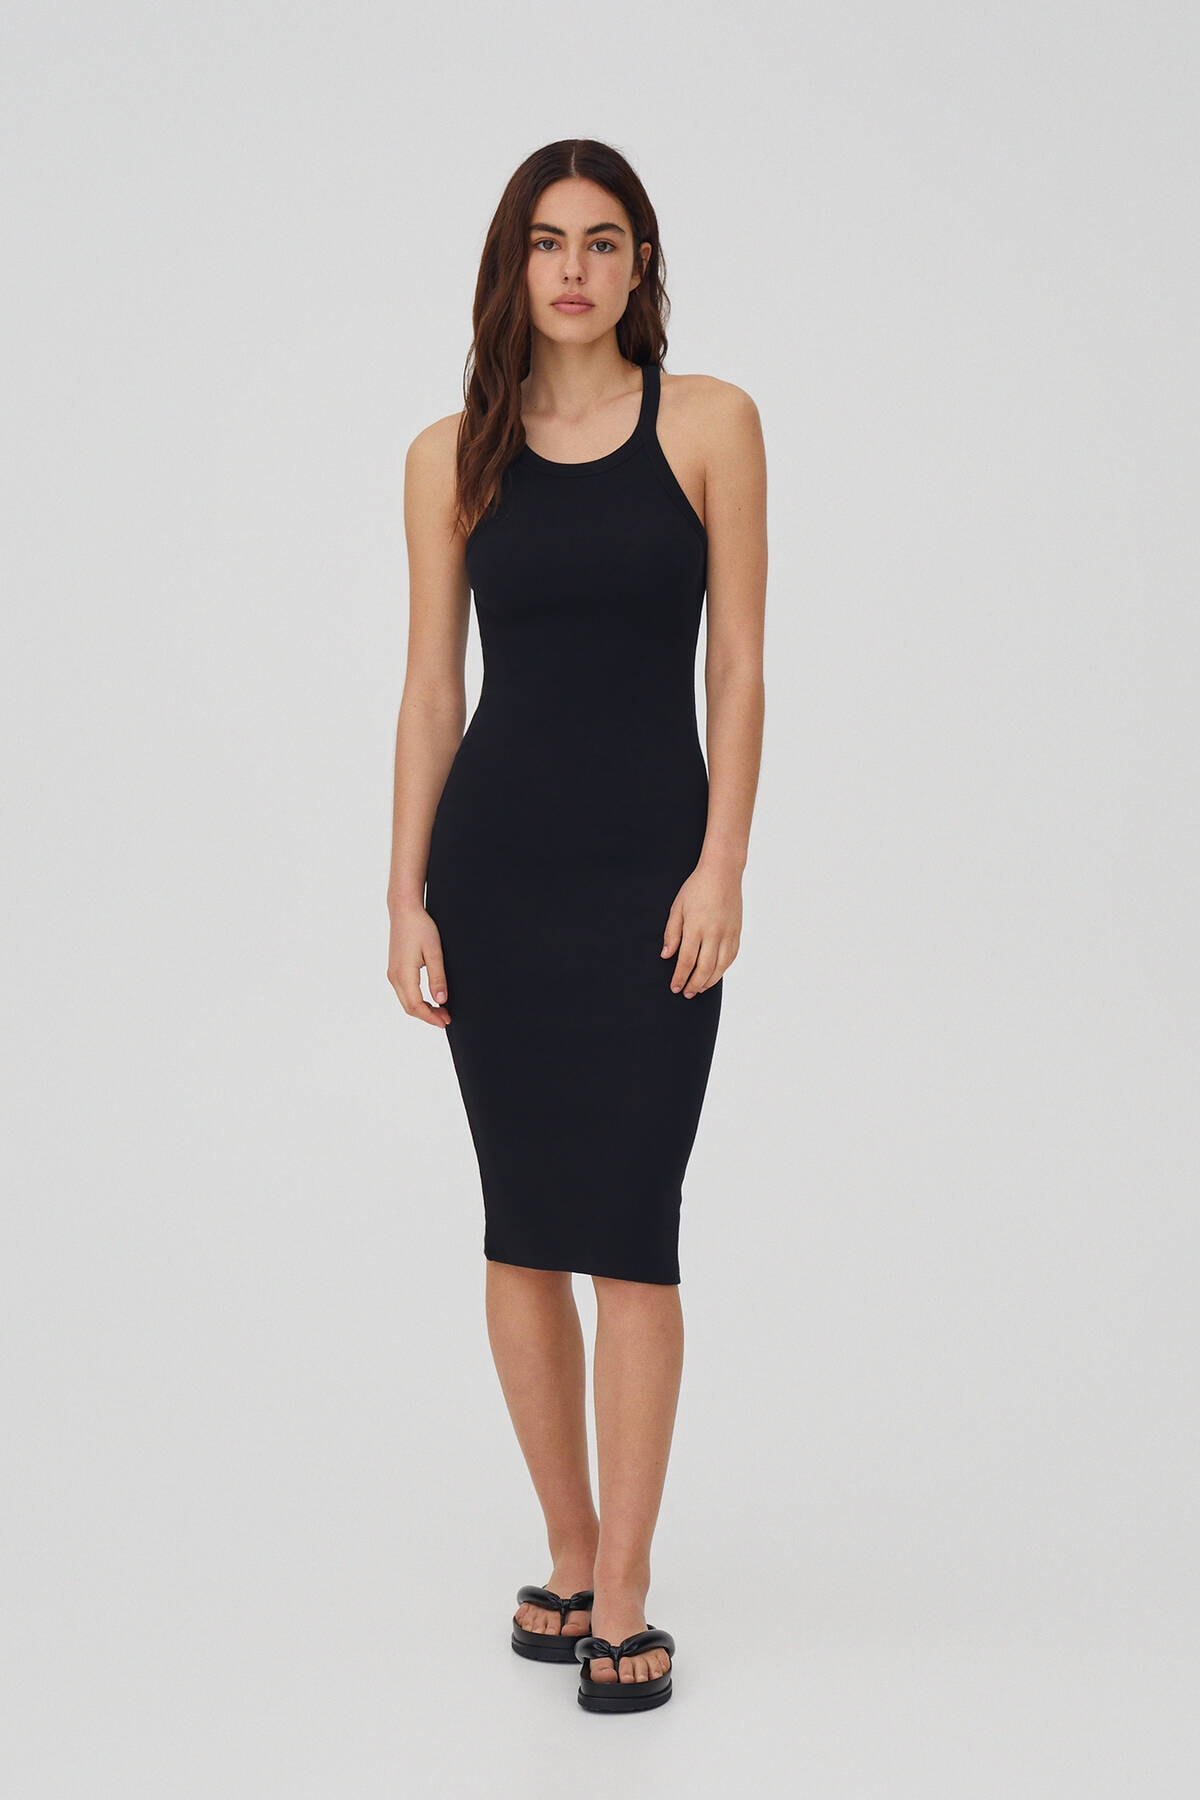 Pull & Bear Kadın Siyah Fitilli Basic Halter Yaka Elbise